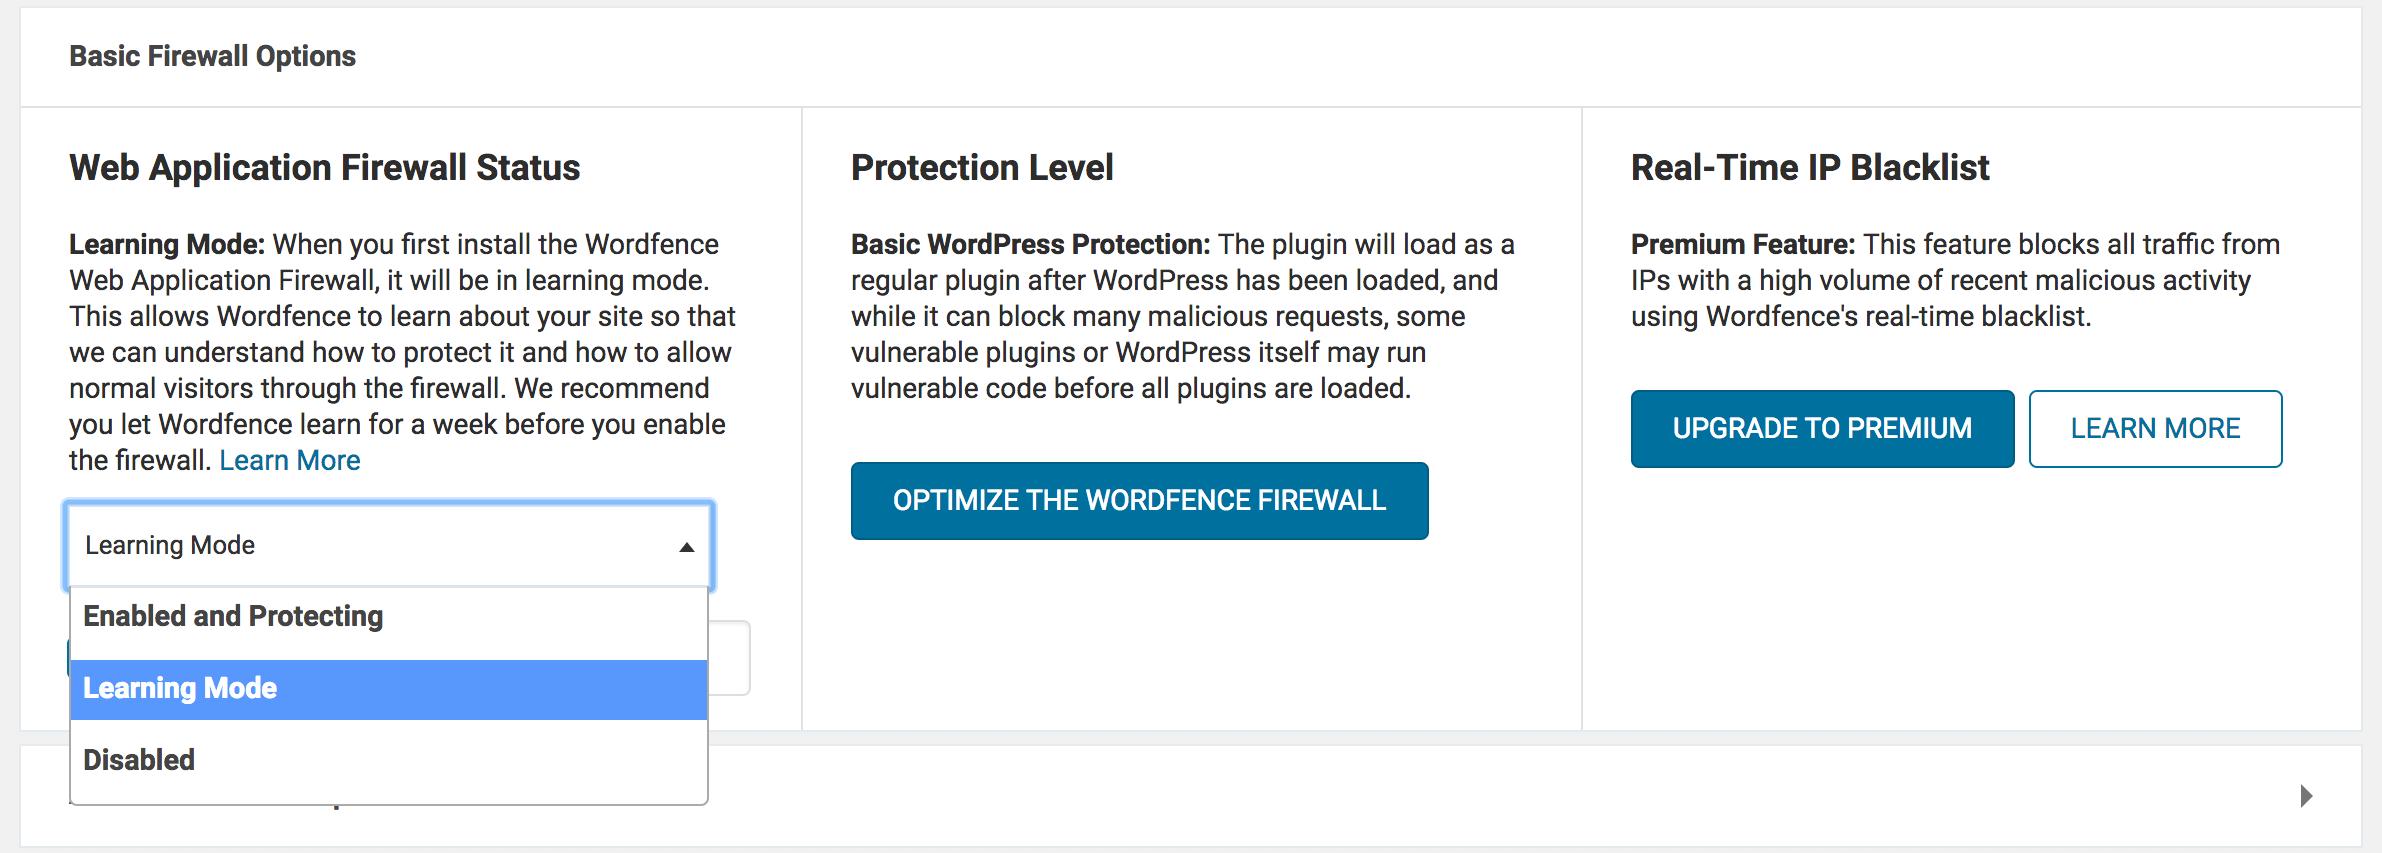 92e0d0e5568318008e9a693db3bf33a6 How to Keep Your Site Secure Using a Web Application Firewall (WAF) design tips